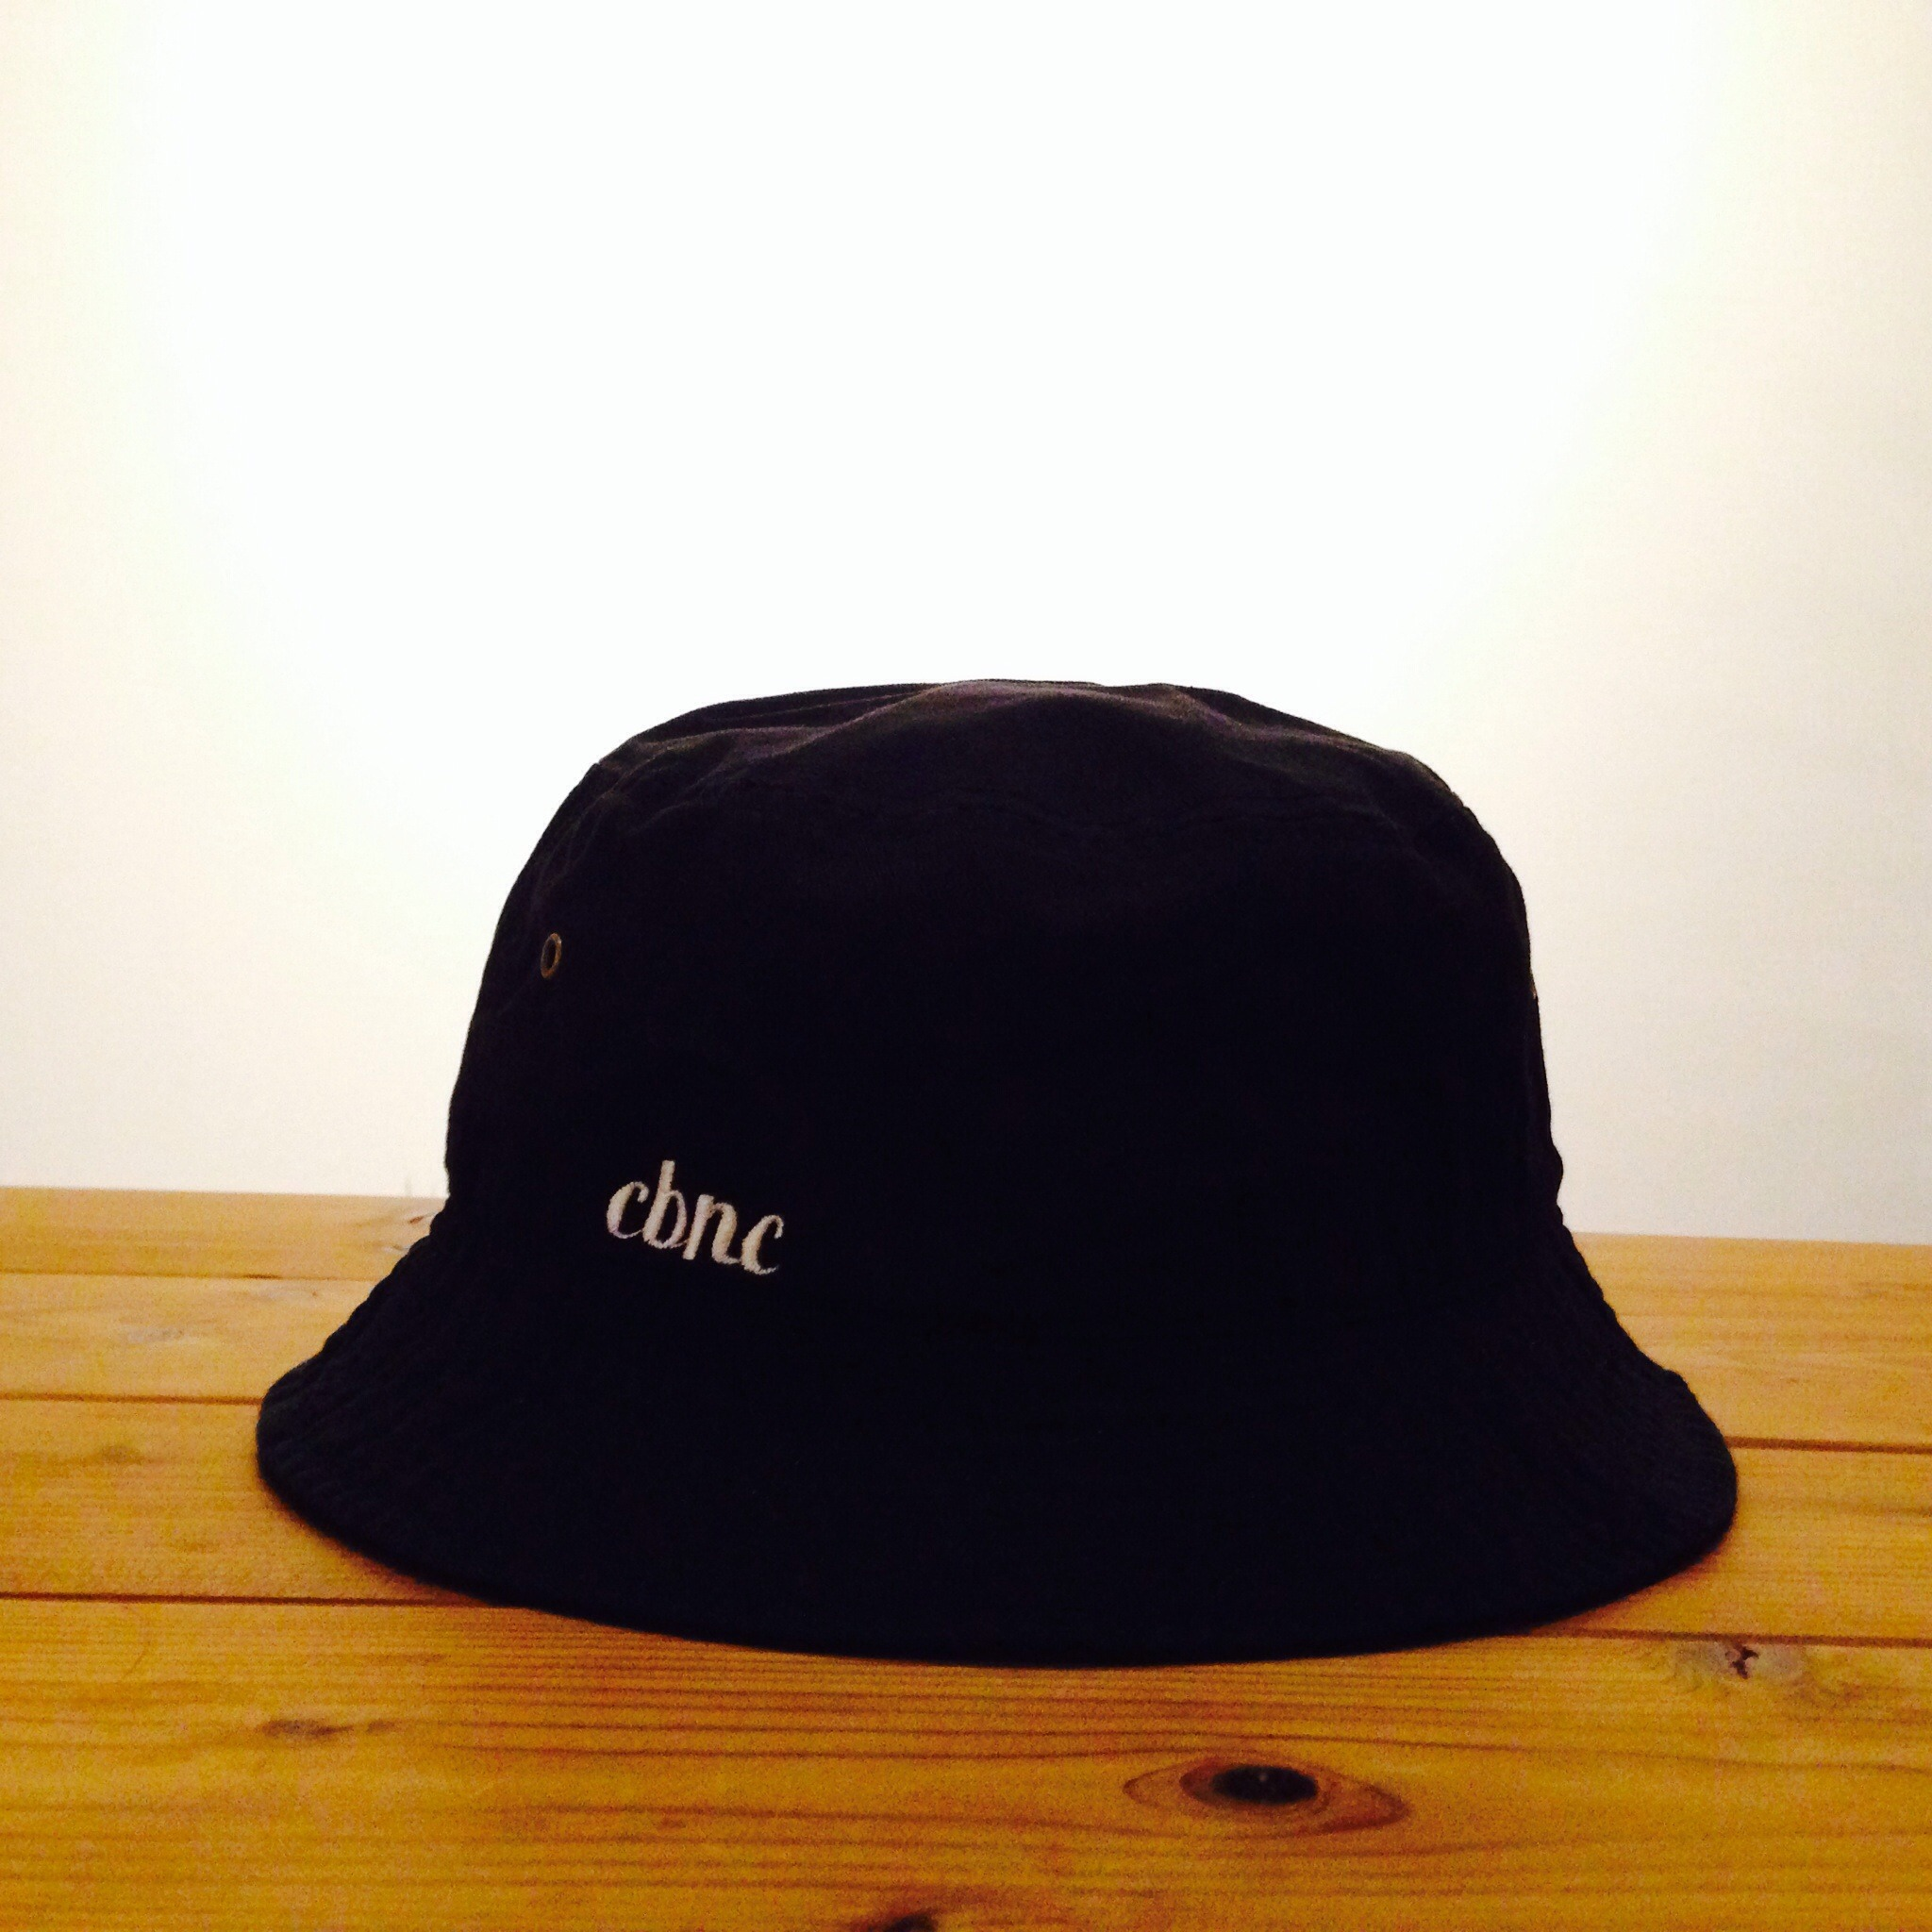 carbonic CBNC Backet Hat